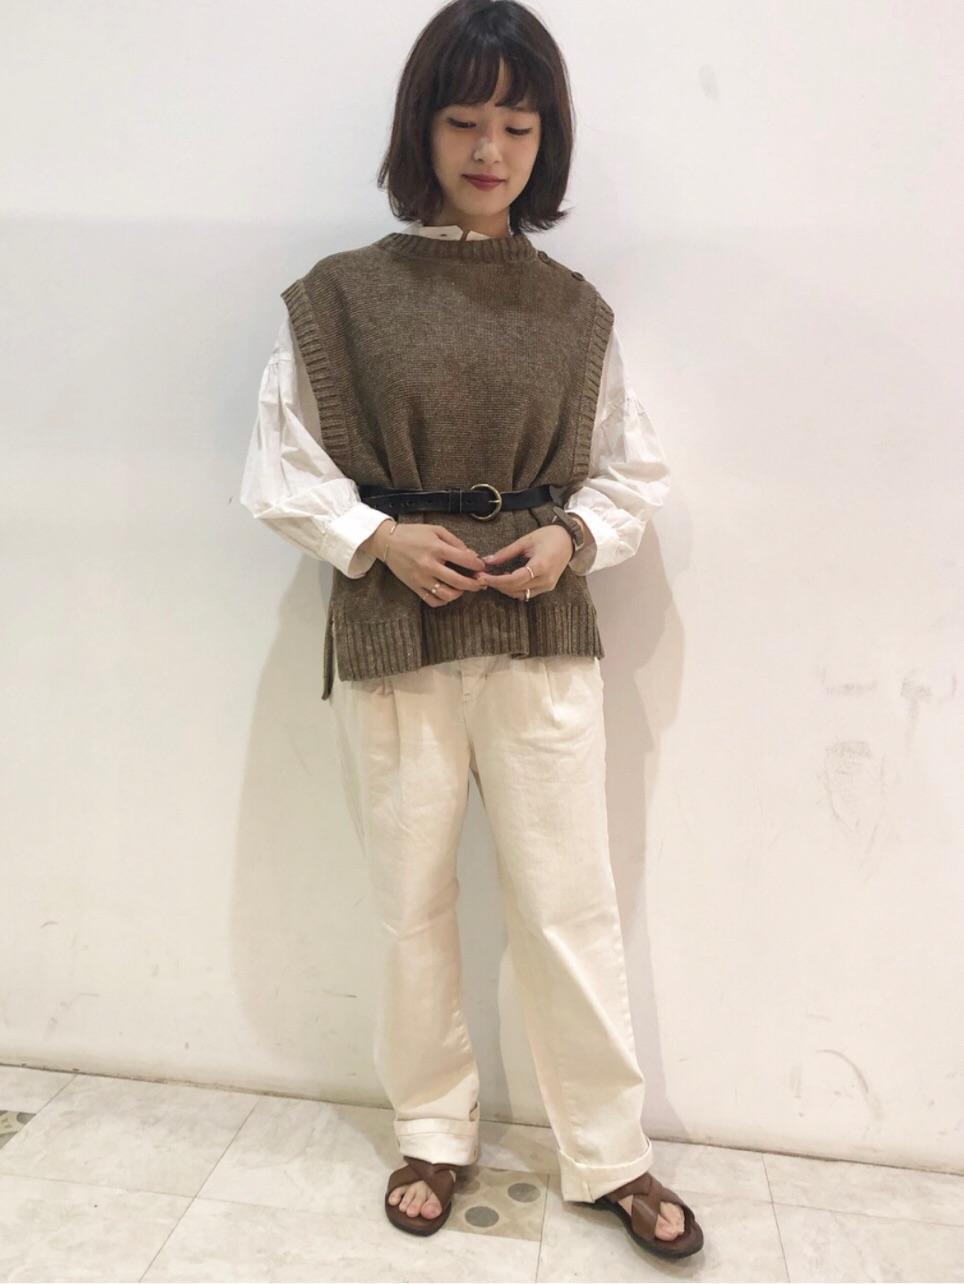 bulle de savon 新宿ミロード 身長:154cm 2019.07.10